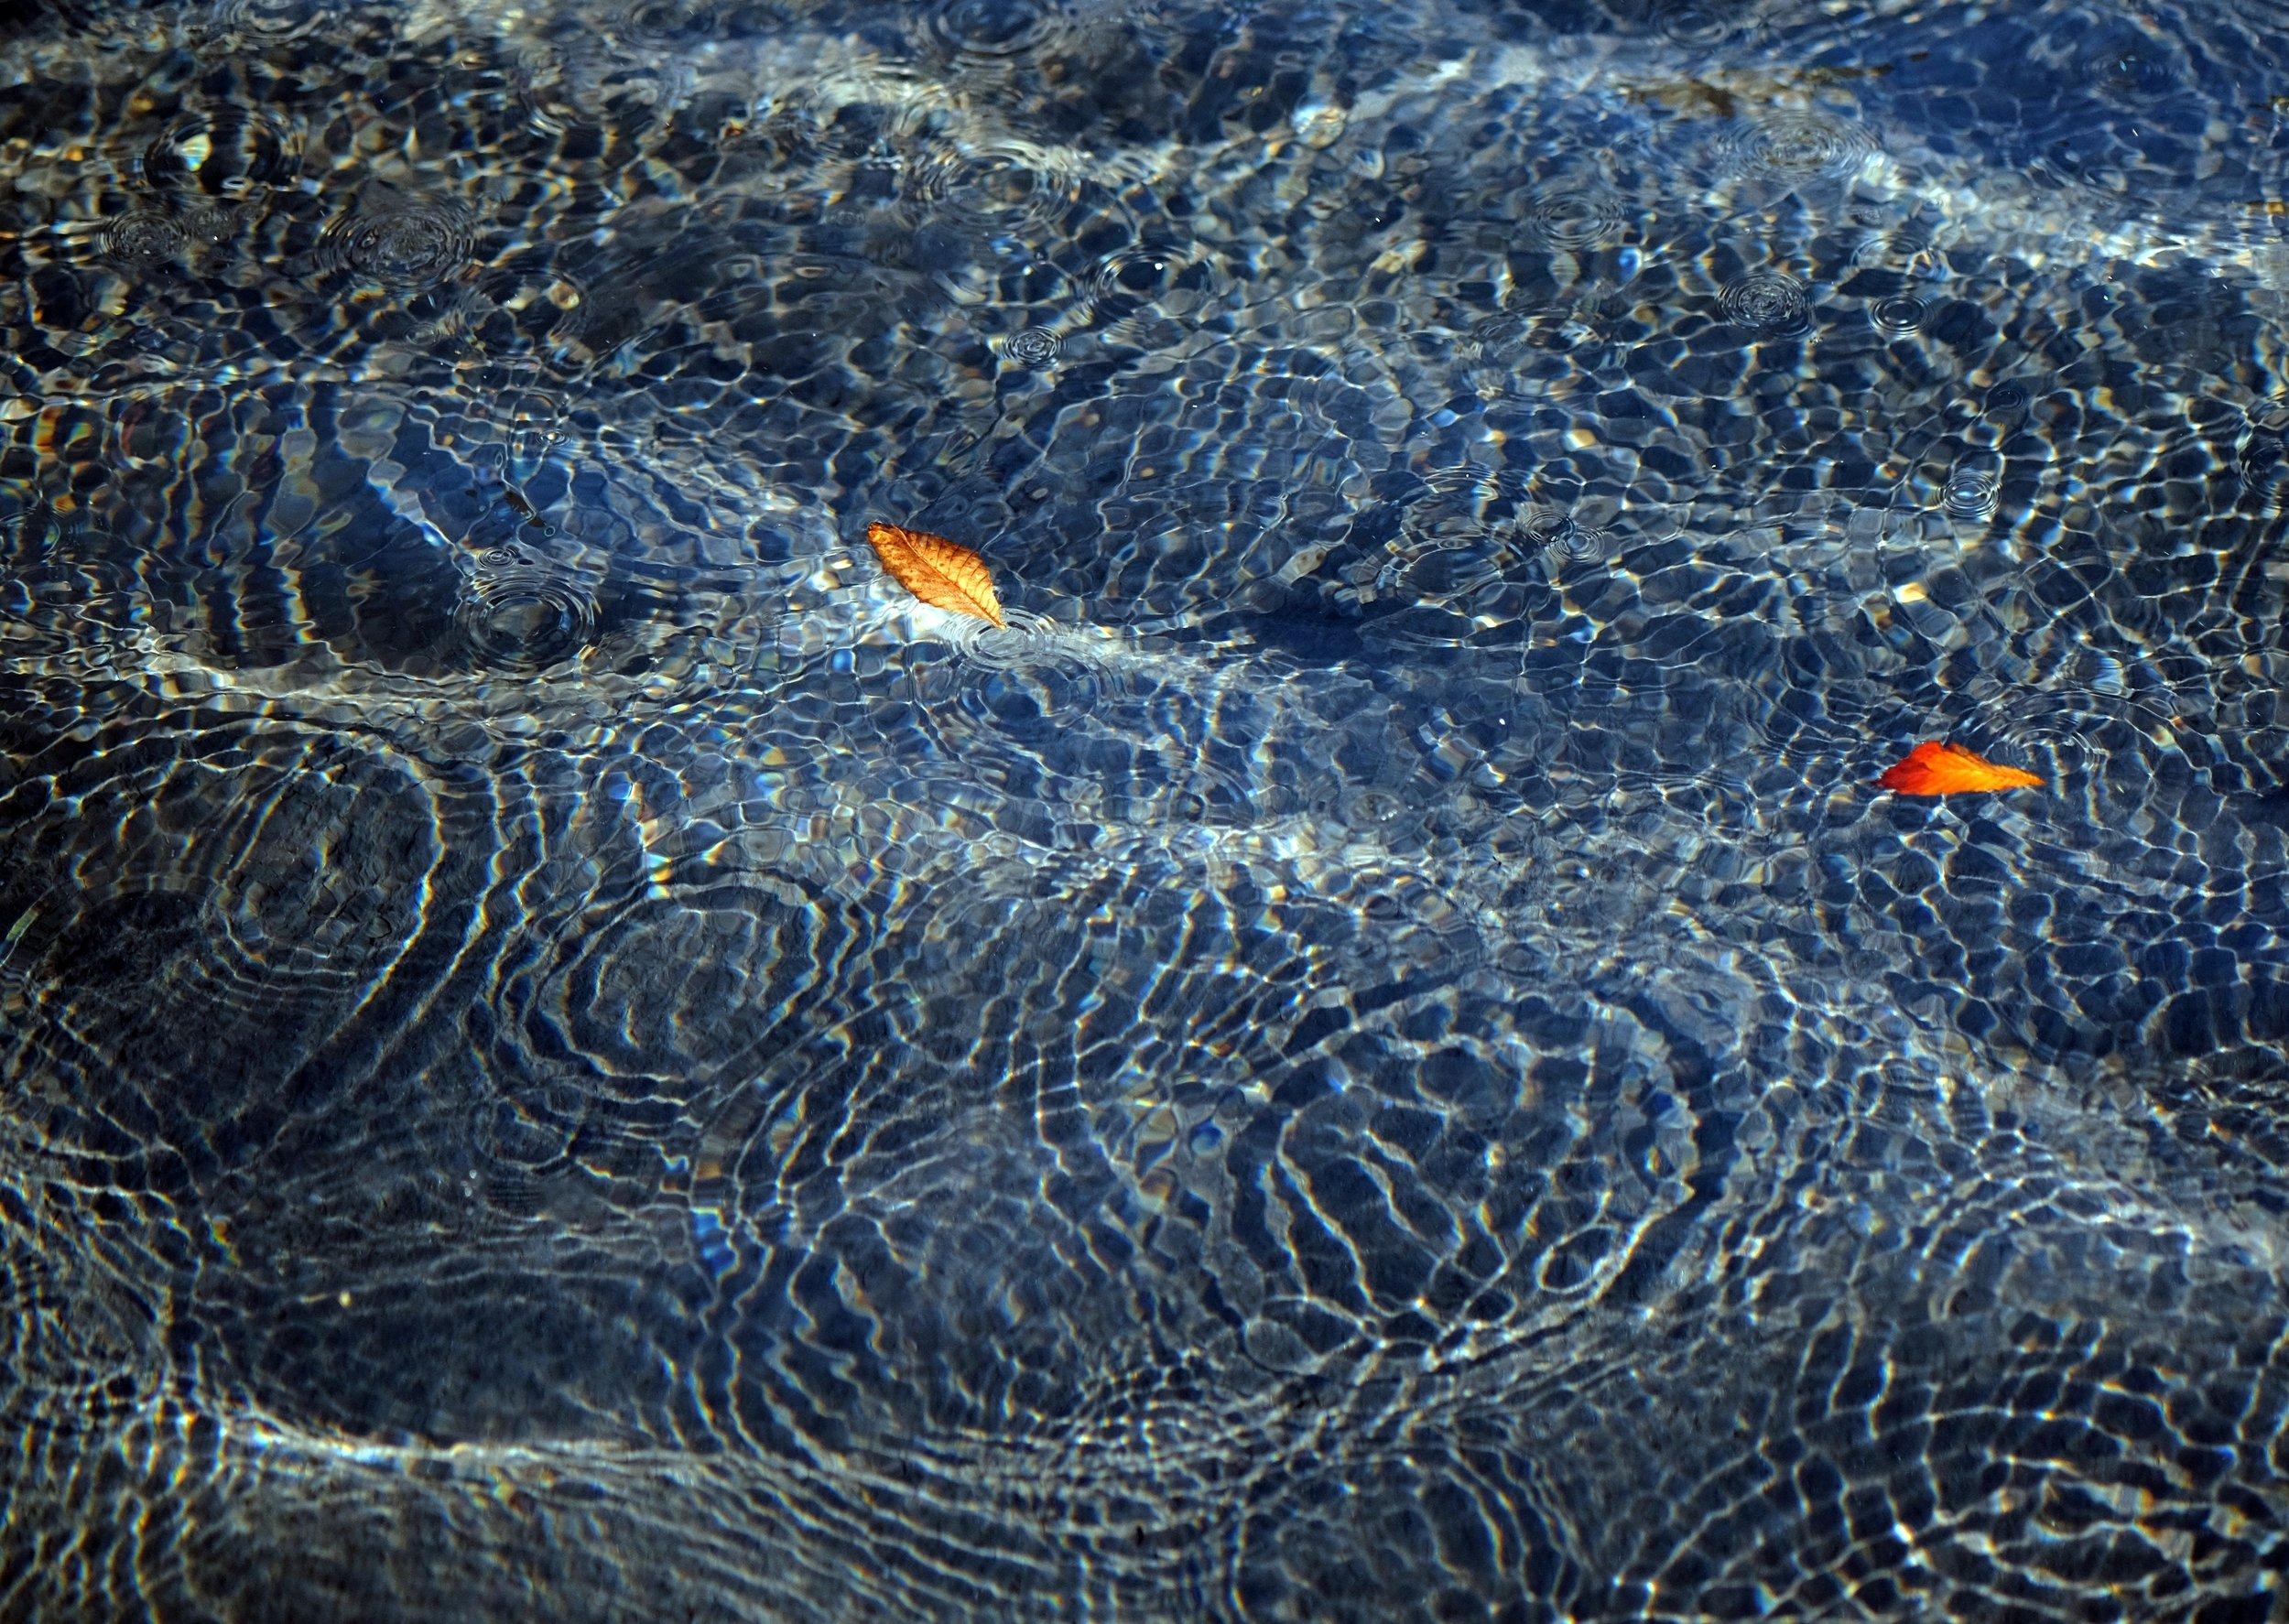 water-surface-ripple-wave-drops-984167.jpg